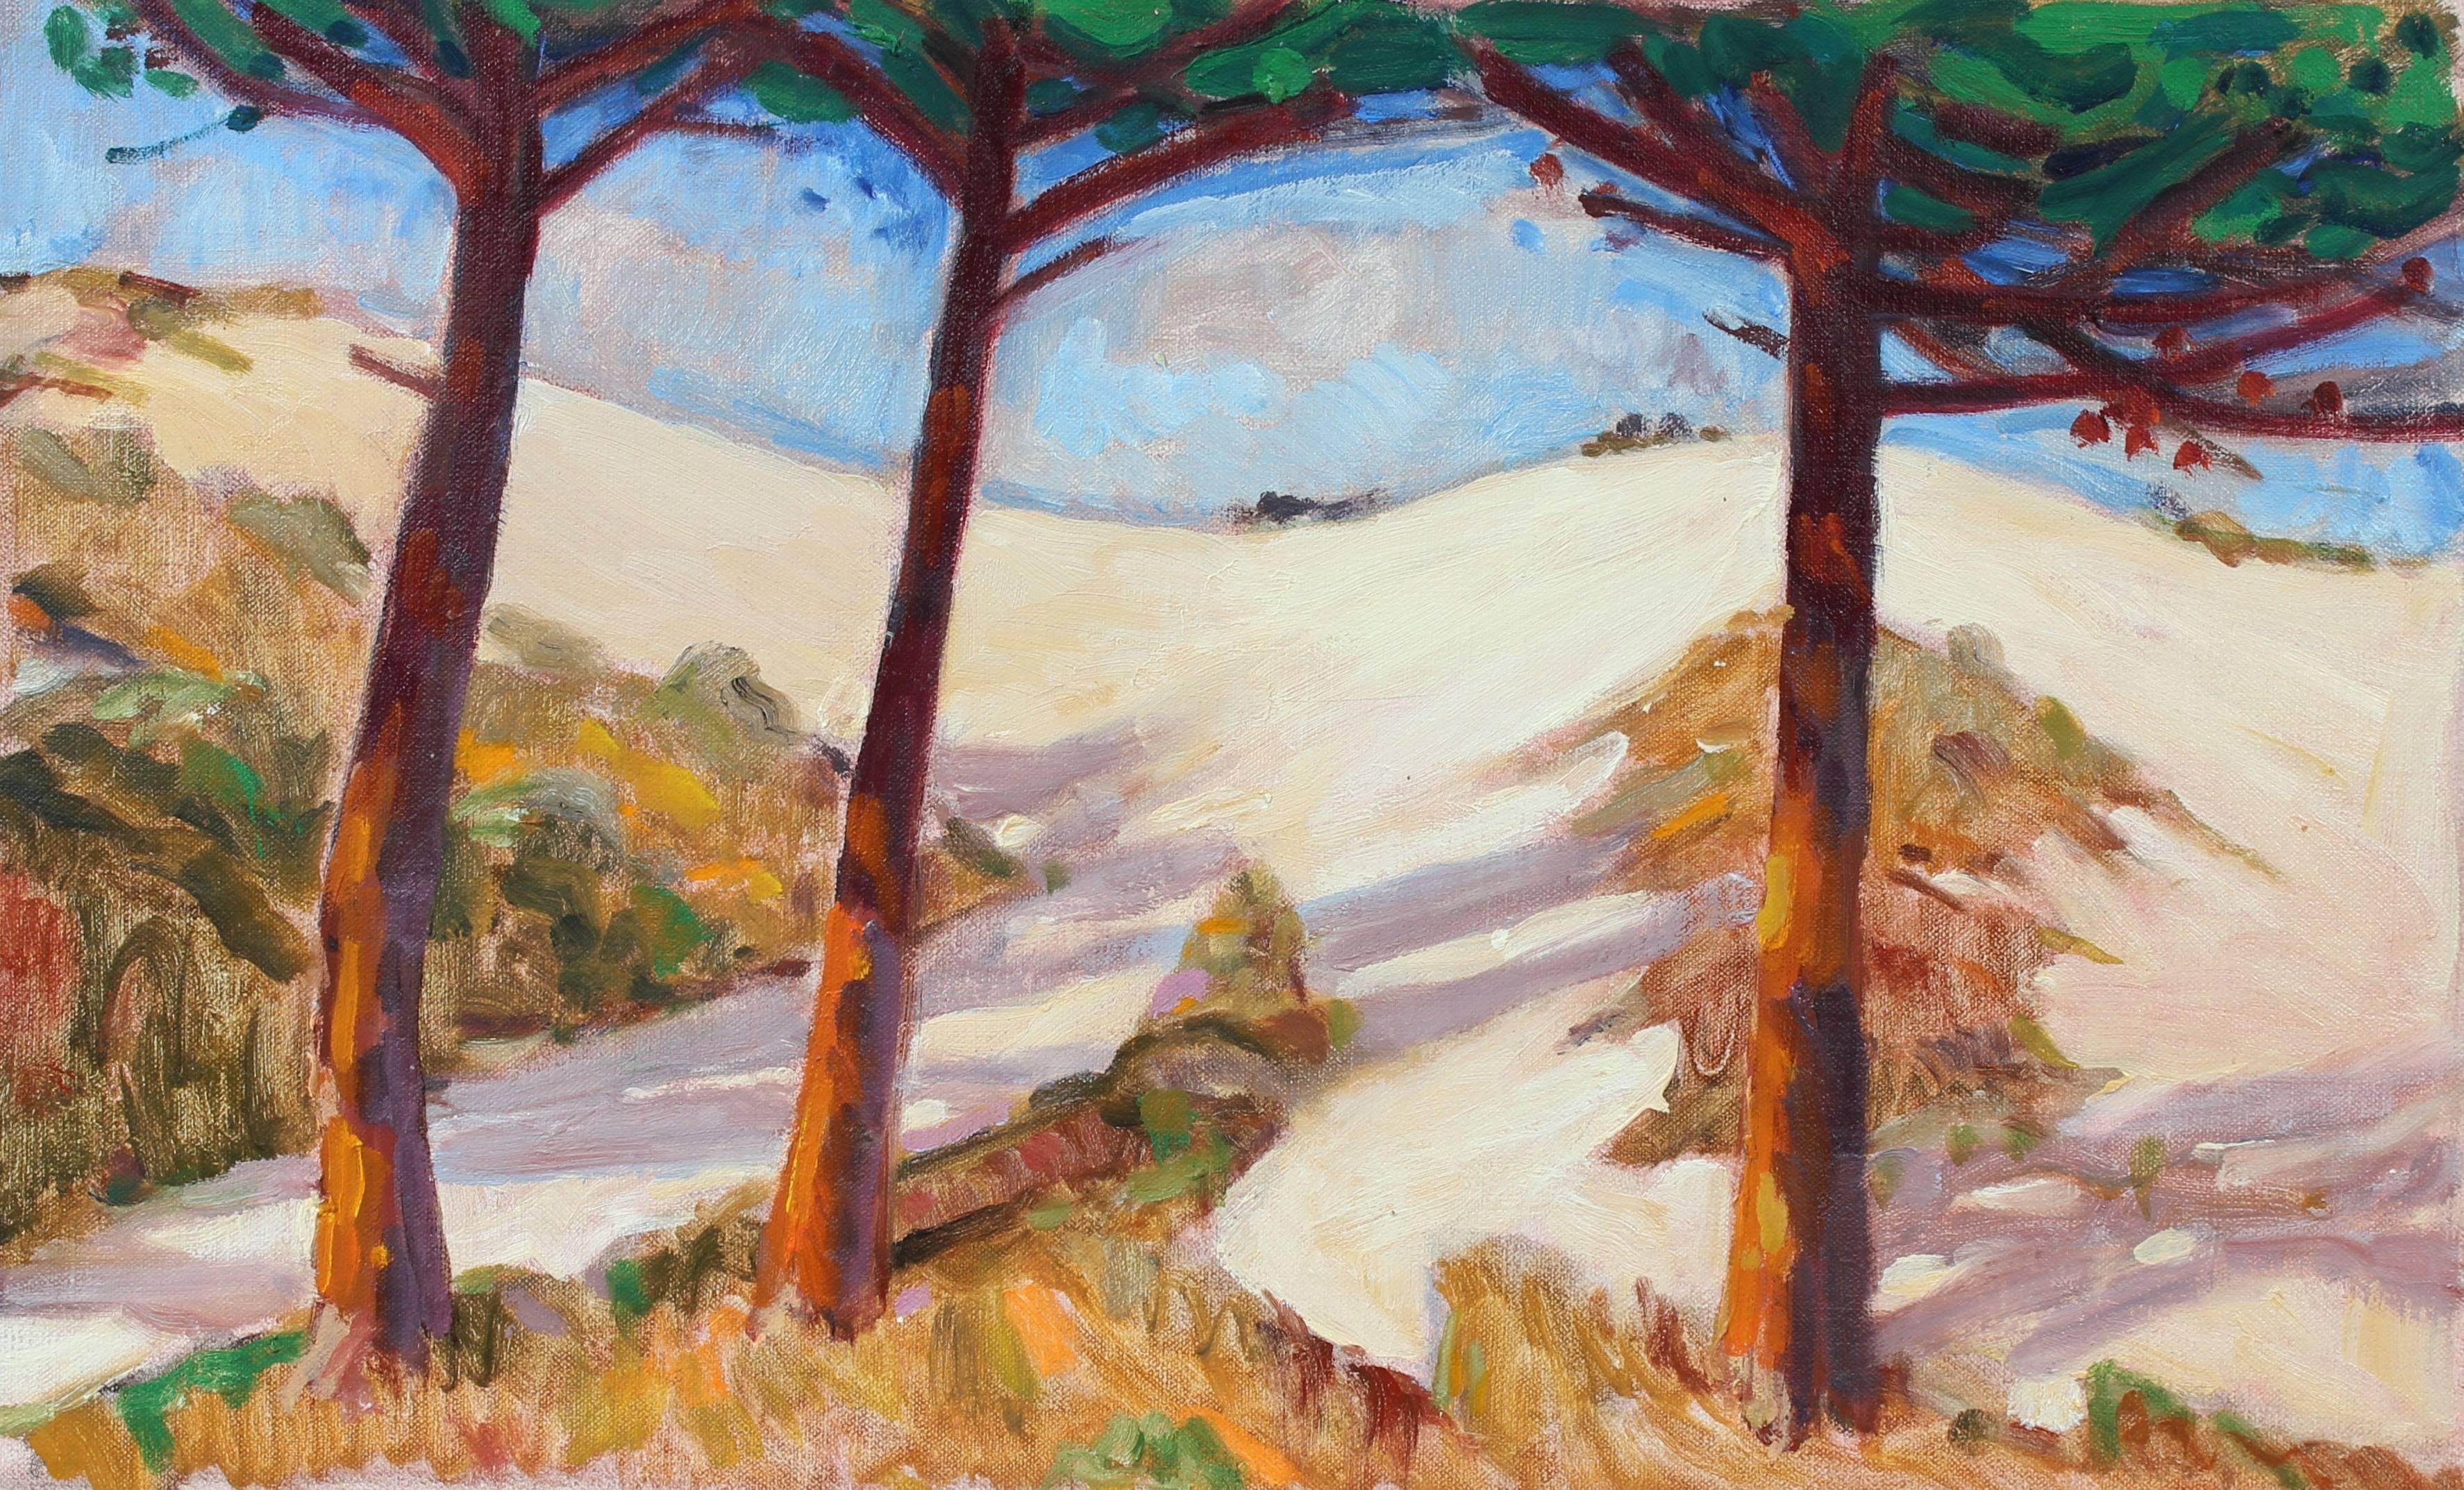 Coastal Sand Dunes & Cypress, Oil on Linen Landscape Painting, 20th Century